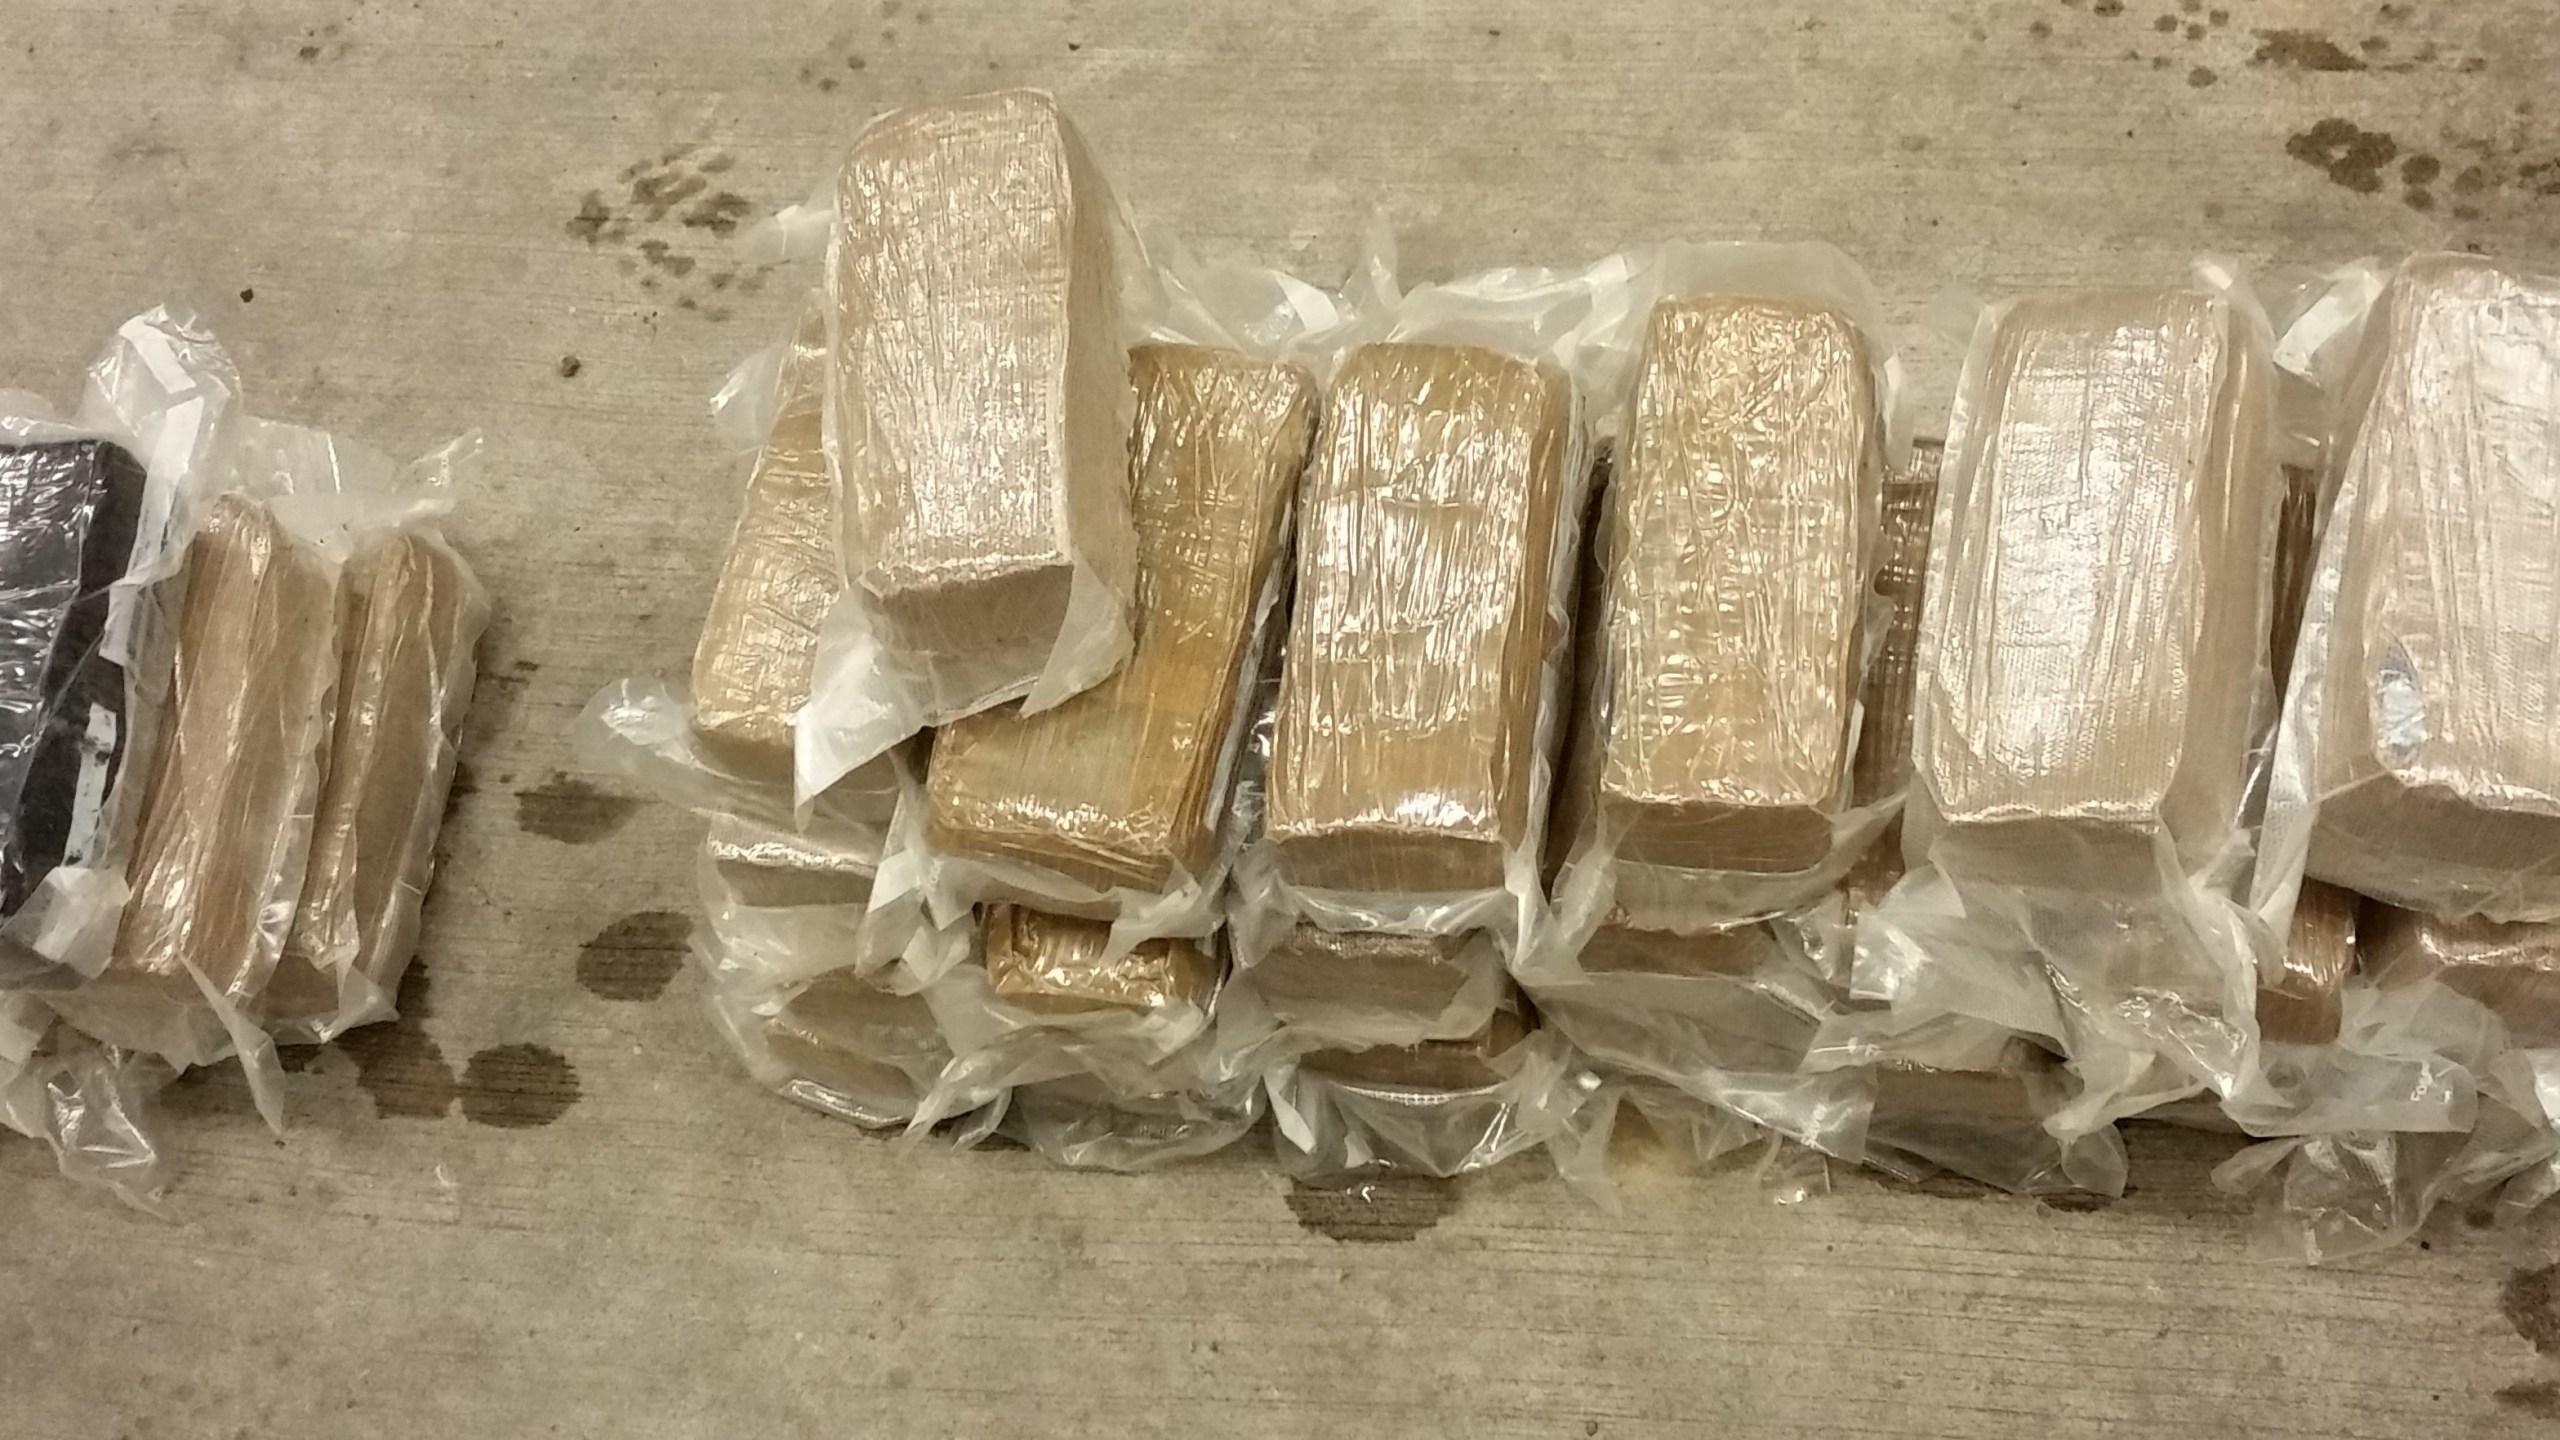 BRO INDIOS 83 lbs MJ 050616 Courtesy CBP Brownsville bmp_1462829347152.jpg